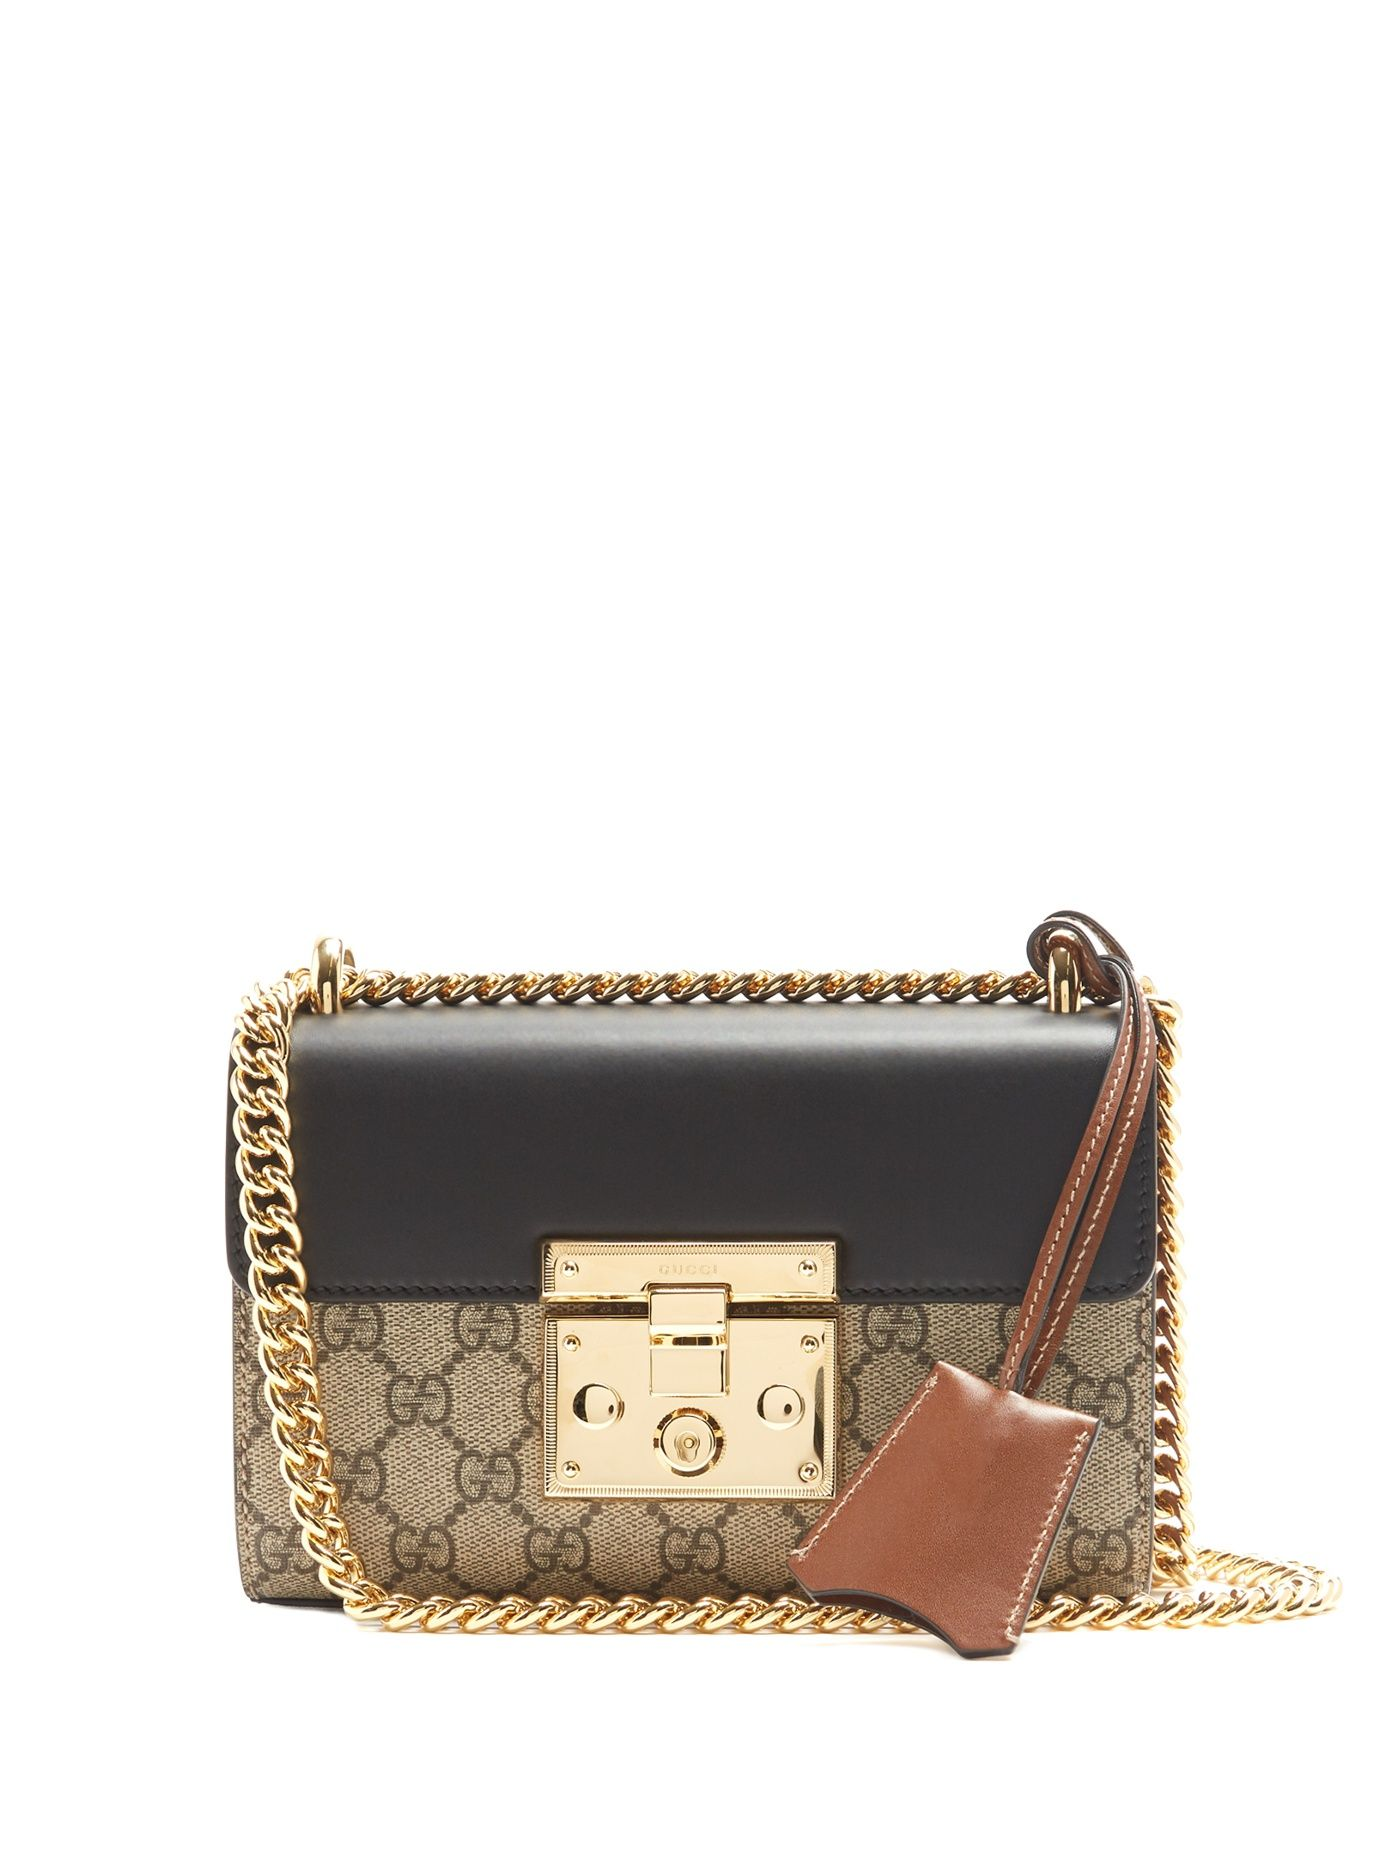 4028fc95 Click here to buy Gucci Padlock GG Supreme small cross-body bag at  MATCHESFASHION.COM